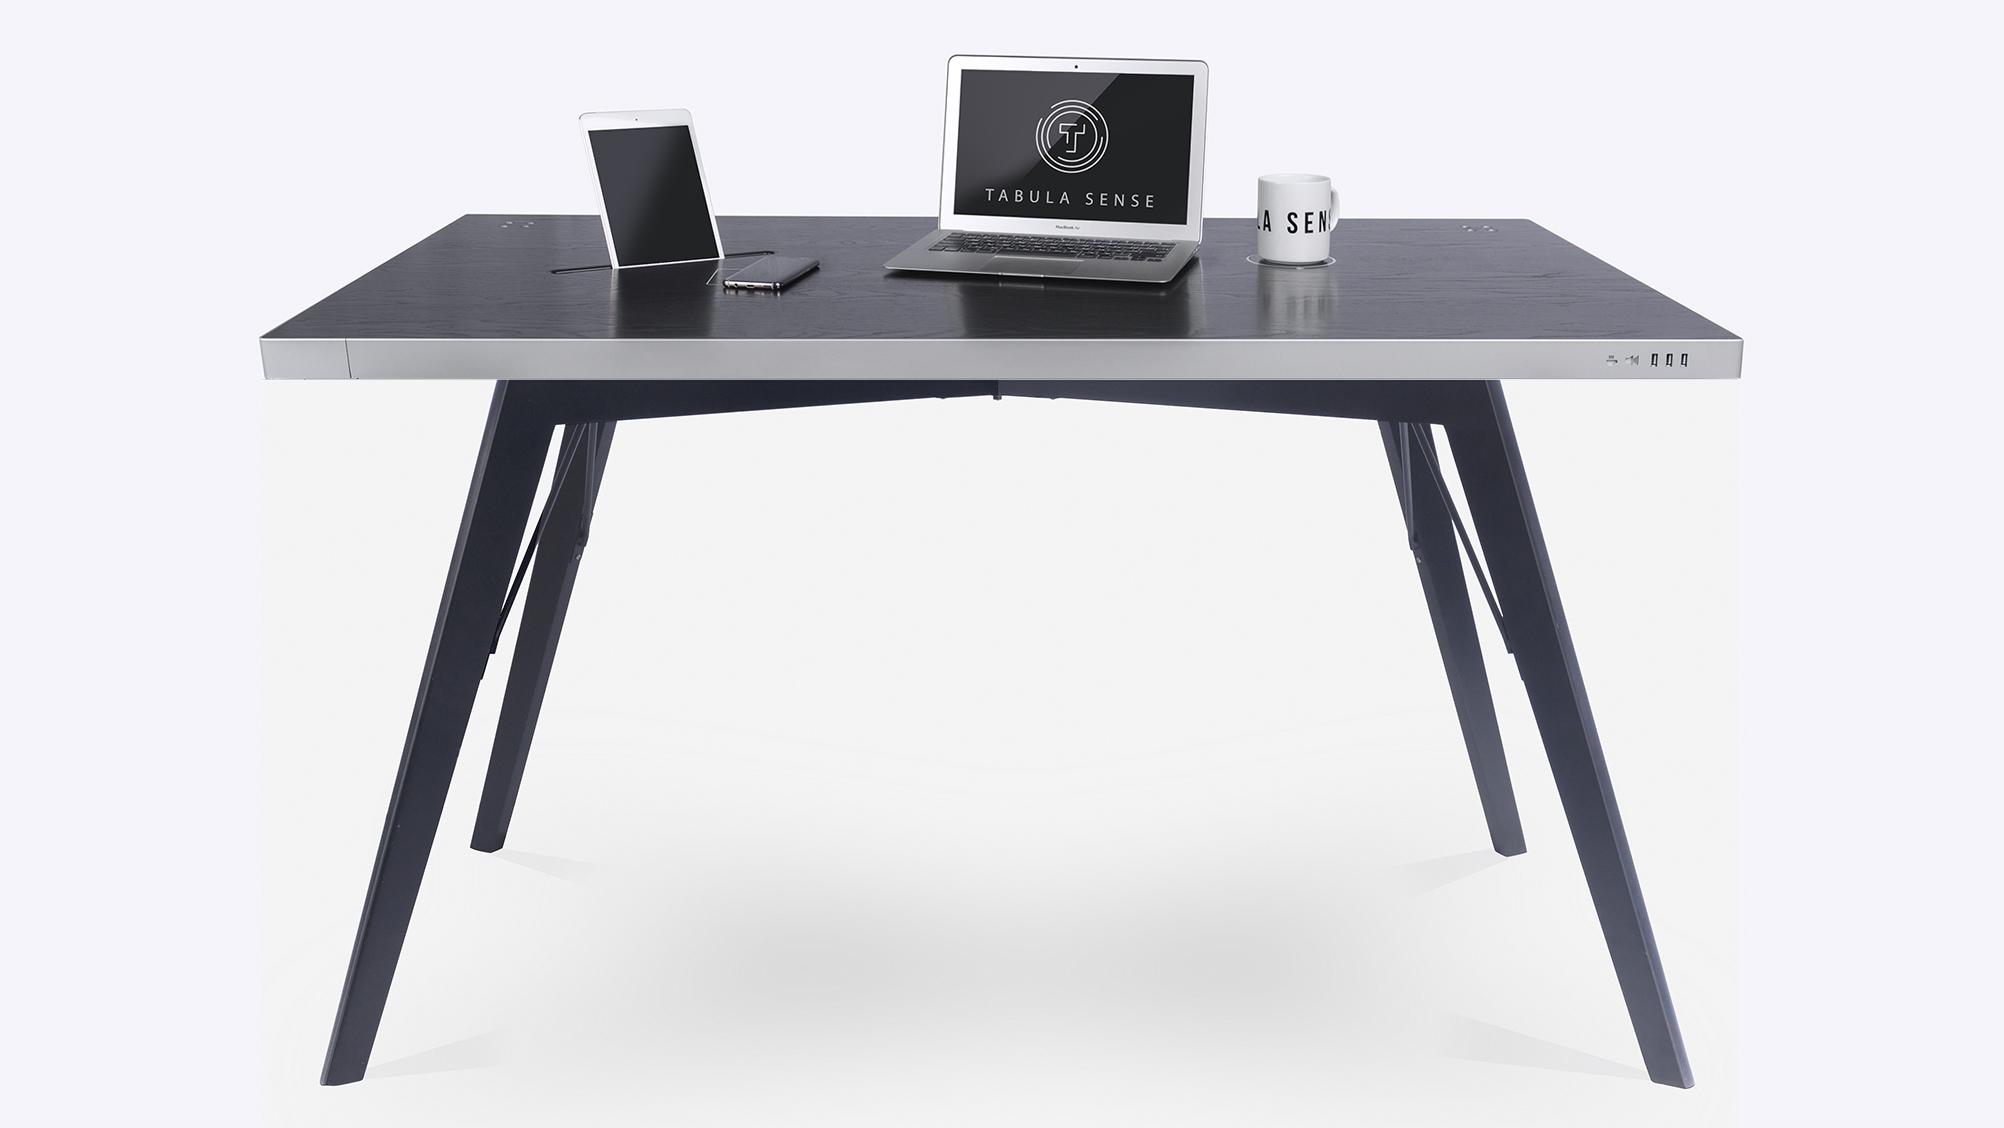 Купить Стол стандартный Tabula Sense Smart Desk Black Birch Black, inmyroom, Россия